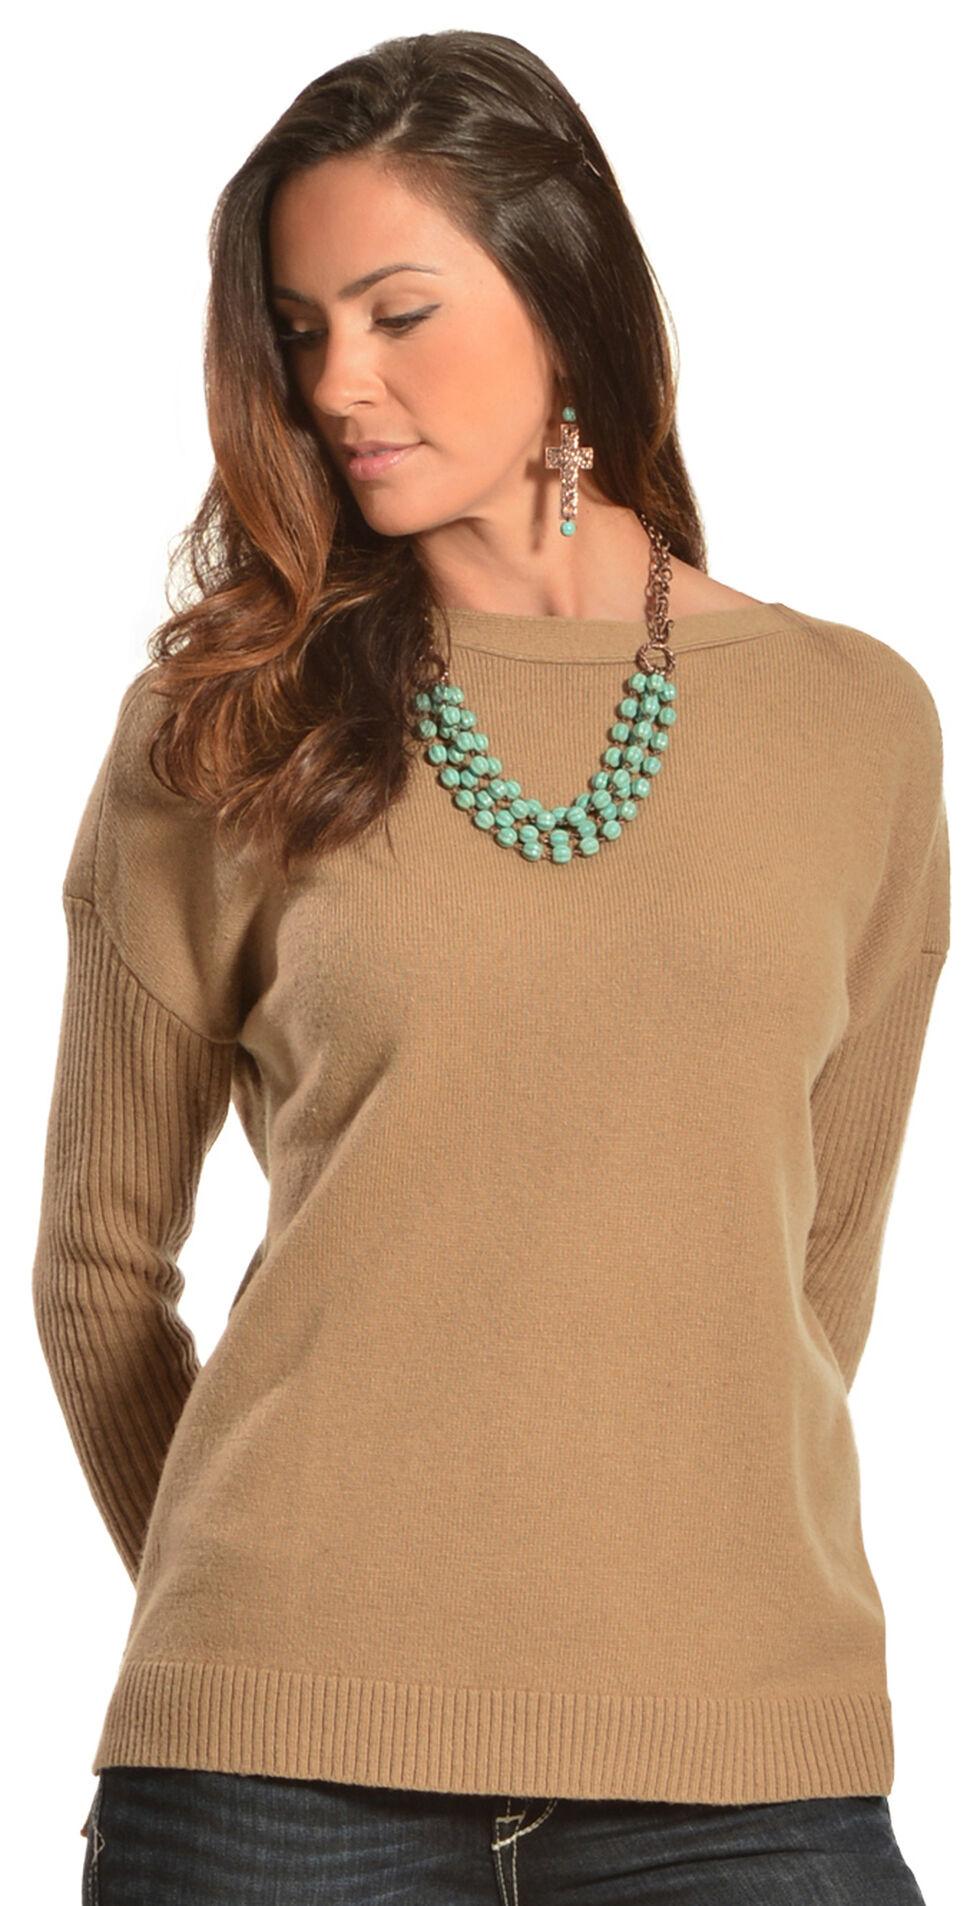 Woolrich Women's Clapshaw Boxy Scoop Sweater, , hi-res